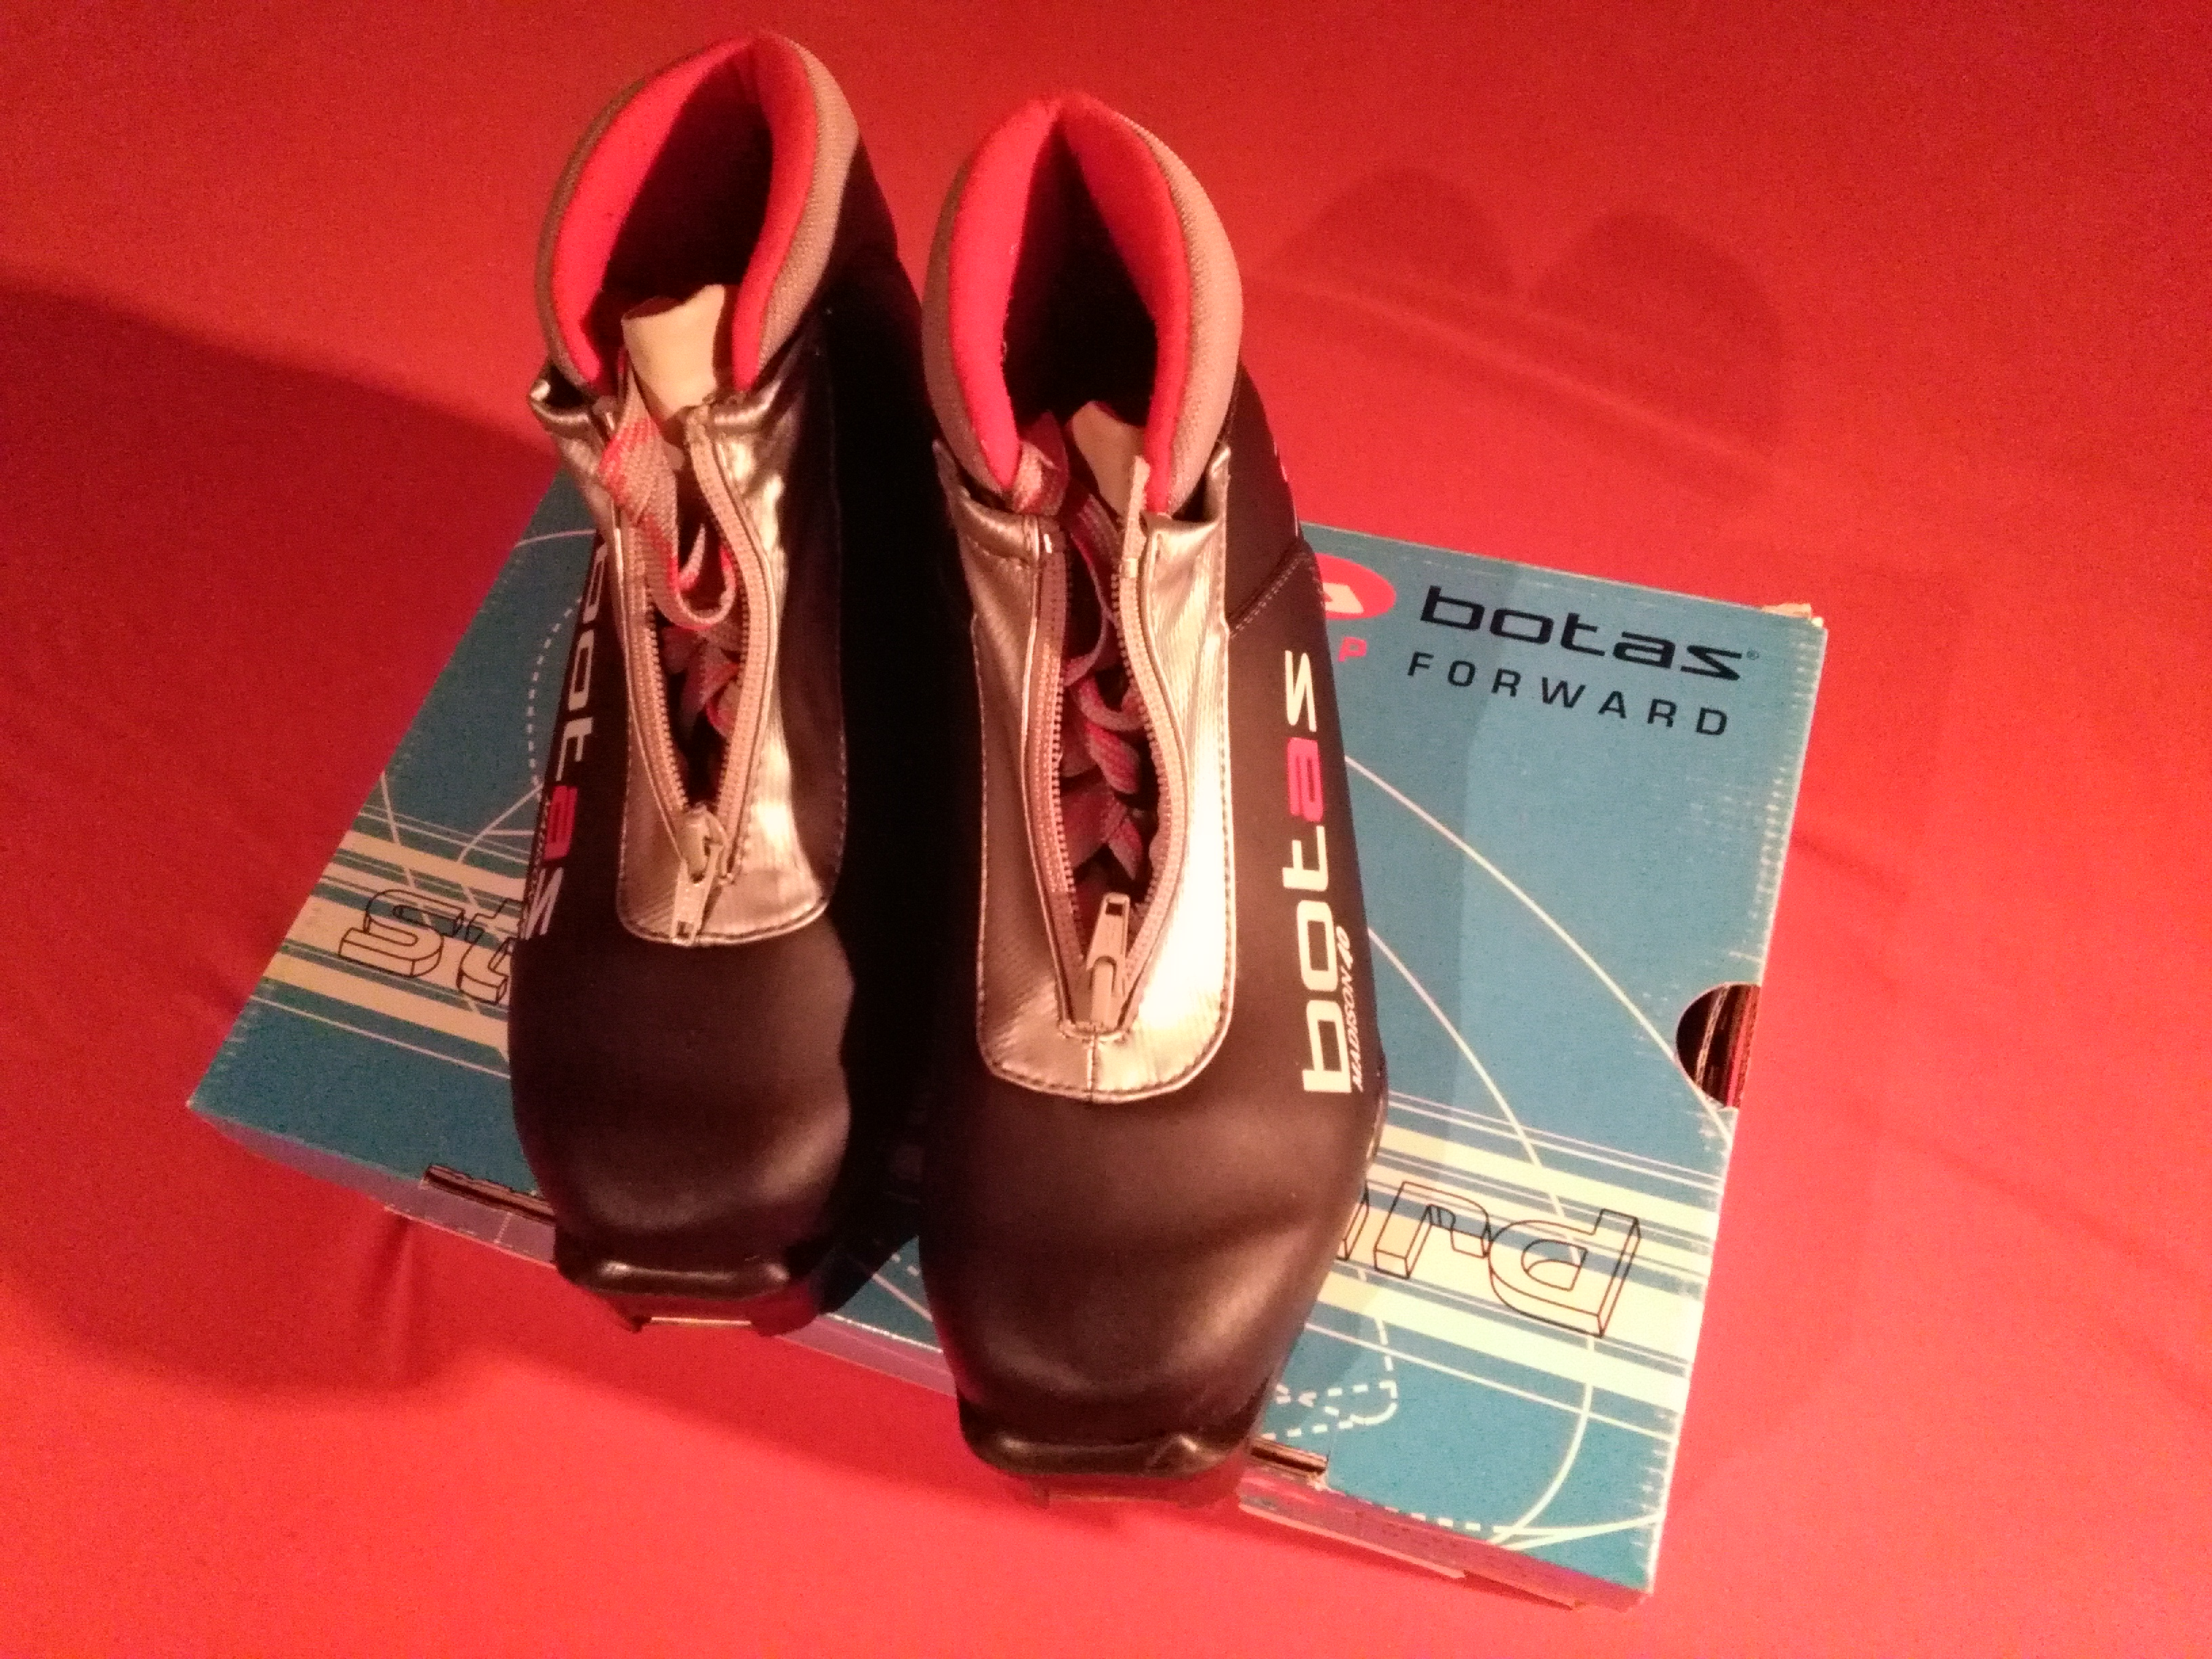 Bezecke boty Botas Madison - Bazar - Běžky.net 559b962f23